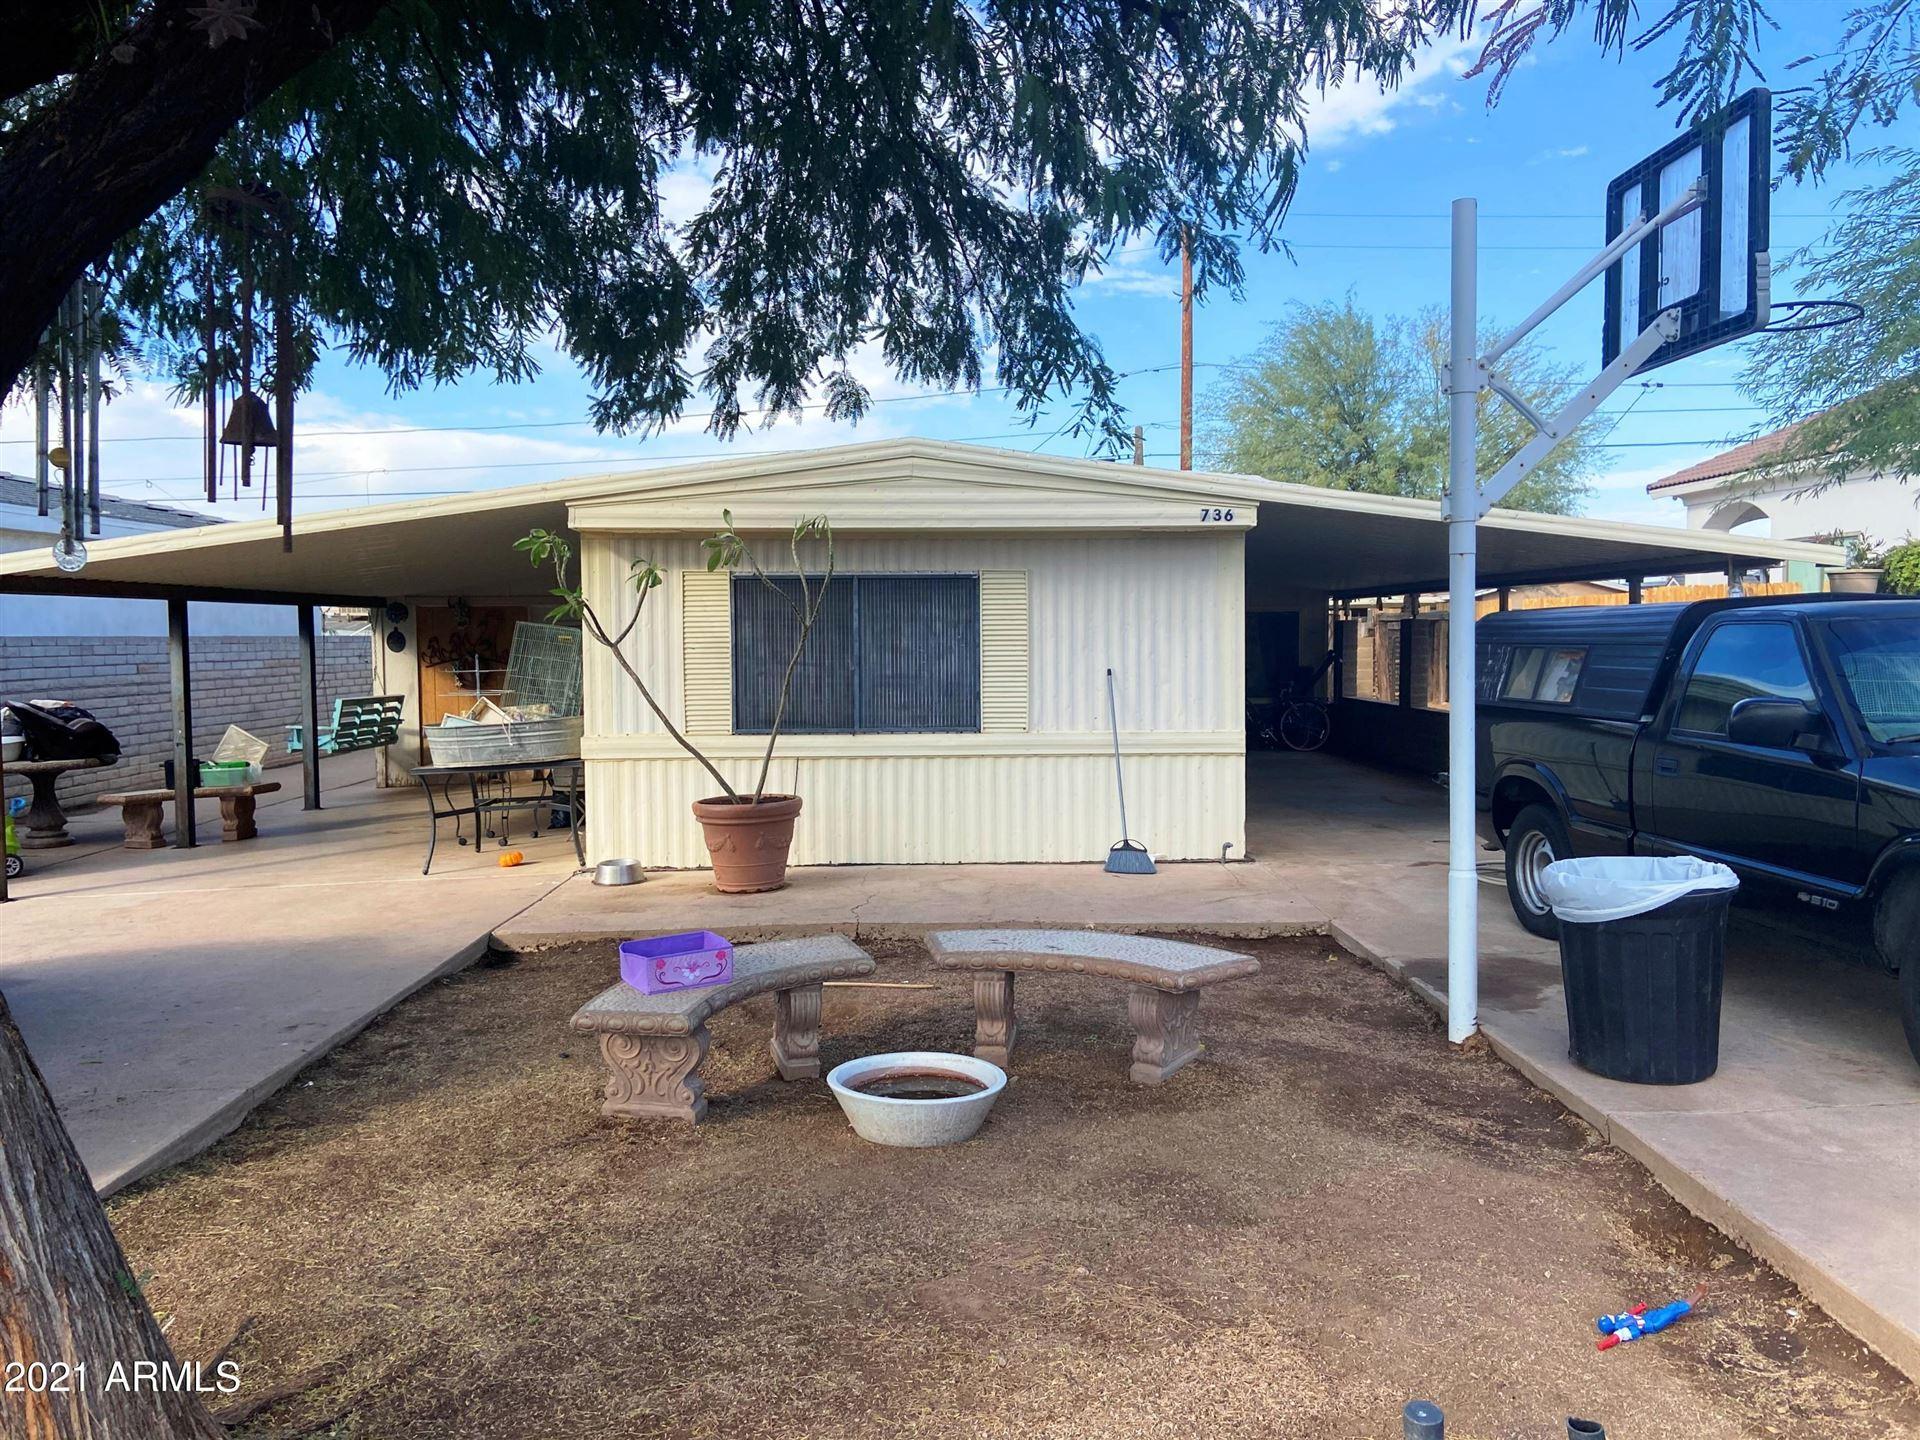 736 W BUIST Avenue, Phoenix, AZ 85041 - MLS#: 6195623